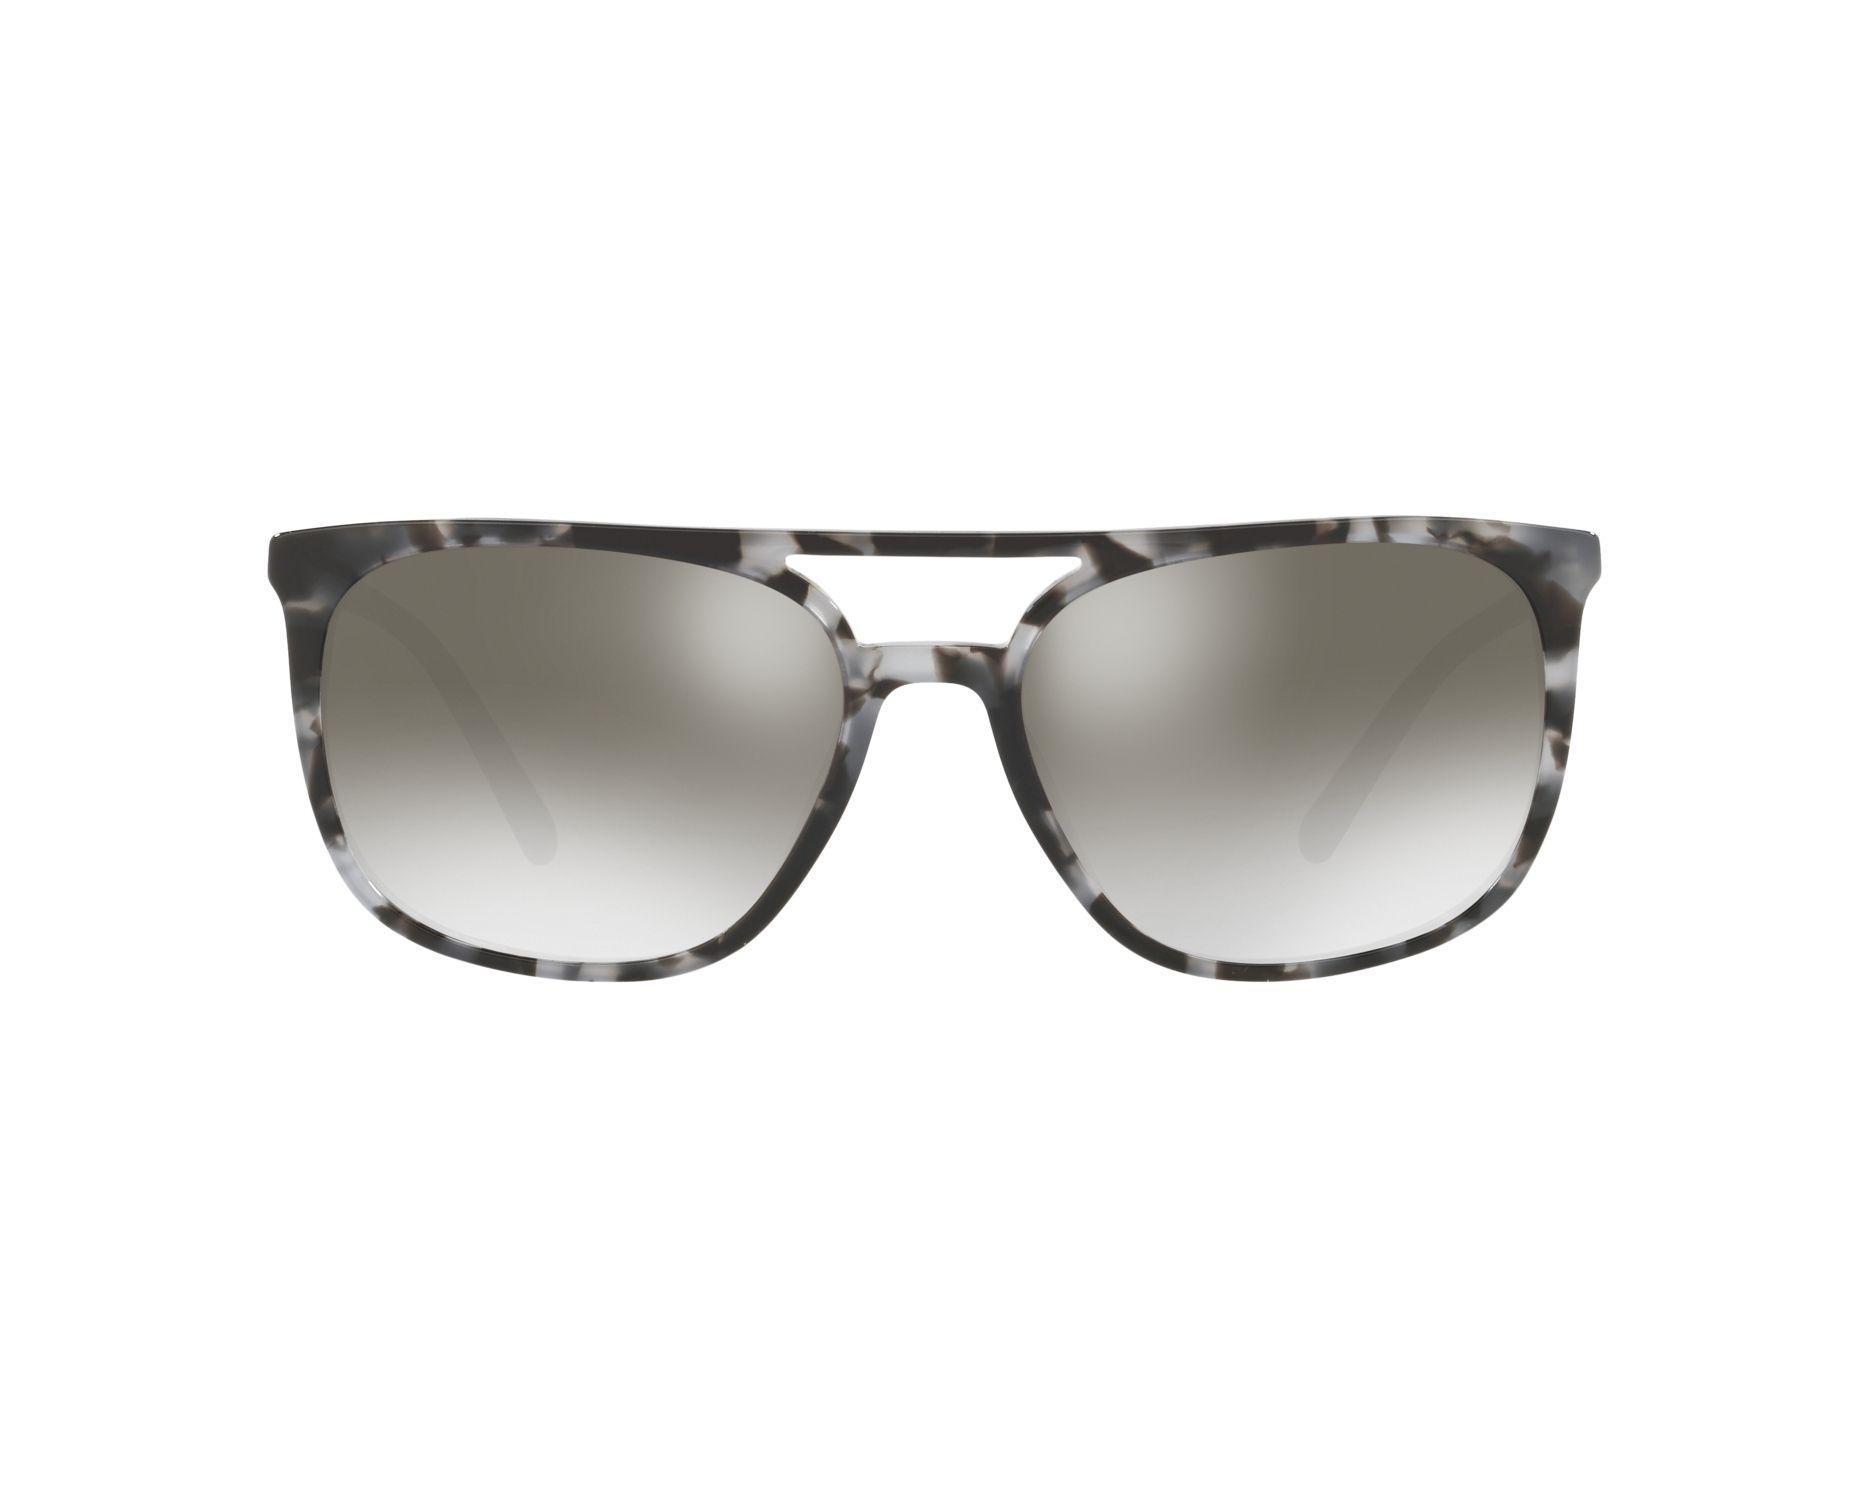 24cf2b2539c Sunglasses Burberry BE-4257 35336l 57-17 Grey Black 360 degree view 1